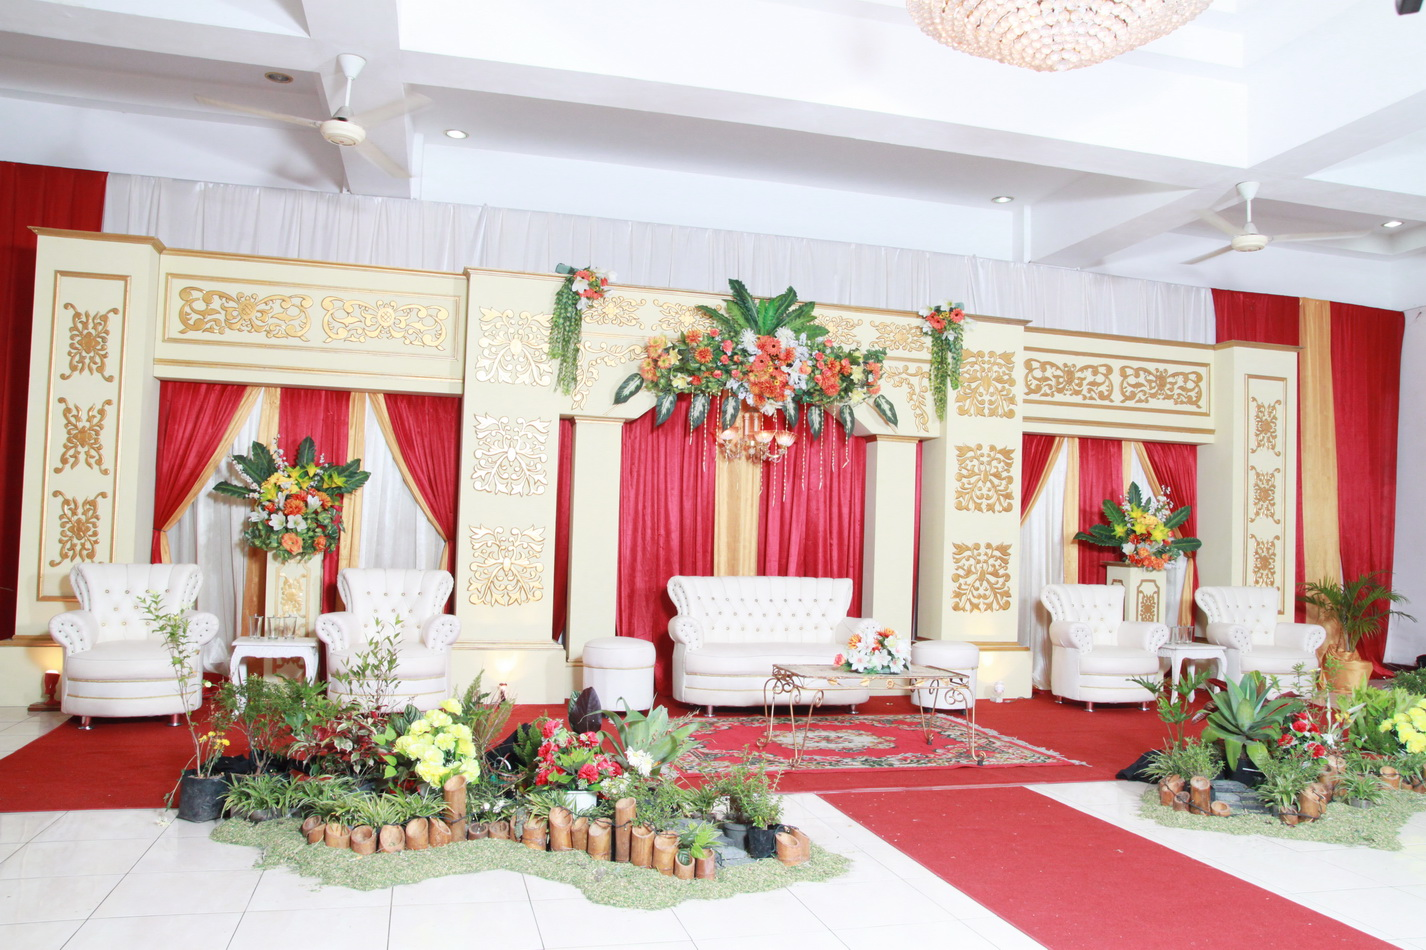 Dekorasi Perkawinan Modern | antokantoklagi